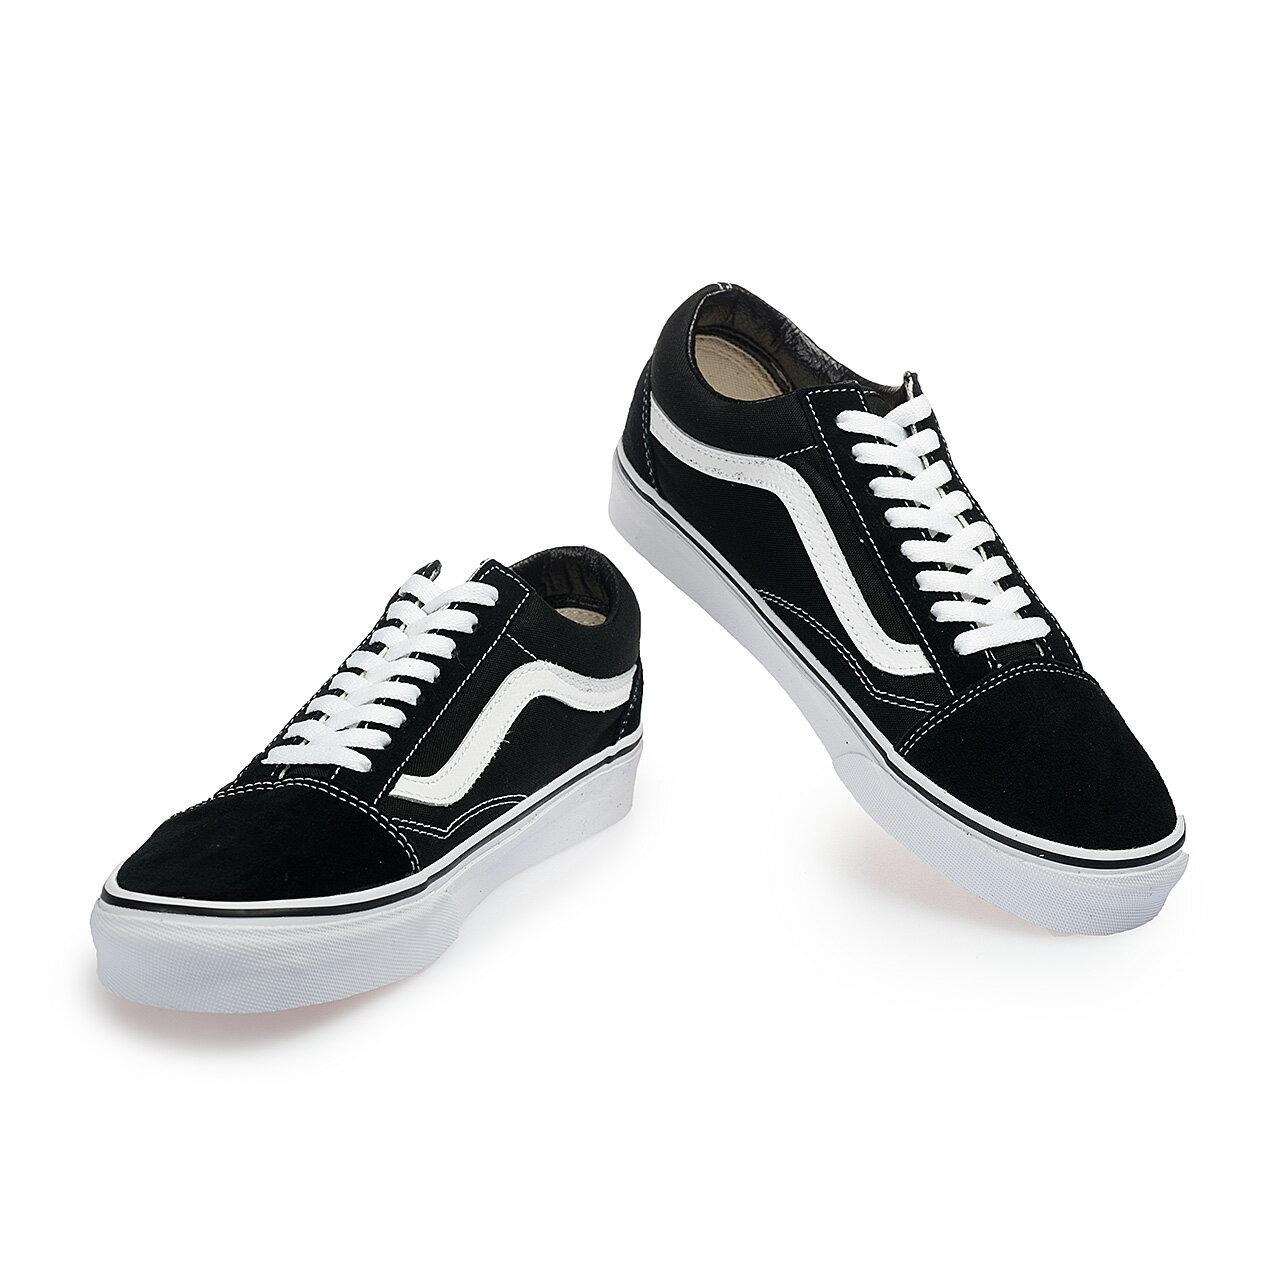 【VANS】 Old Skool 基本款  黑 經典款 休閒鞋 男女 專櫃價2380  VN000D3HY28(palace store) 2